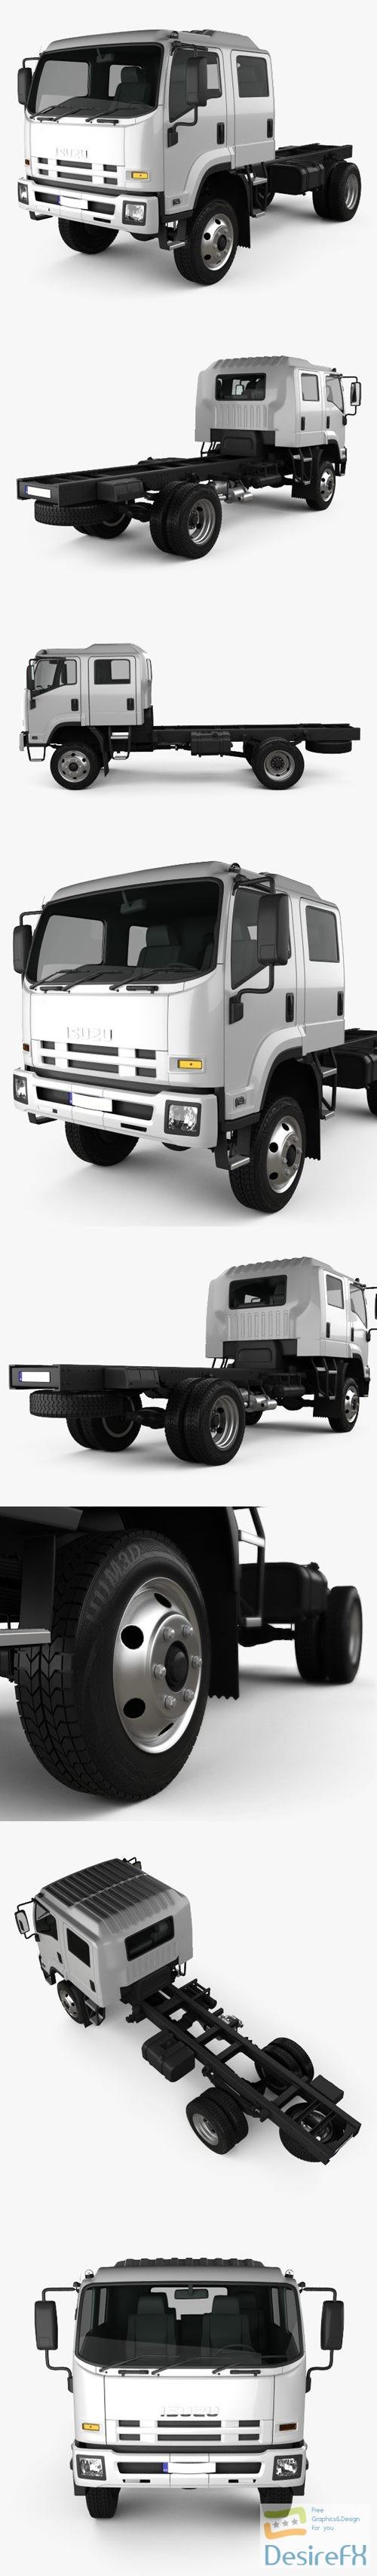 Isuzu FTS 800 Crew Cab Chassis Truck 2014 3D Model